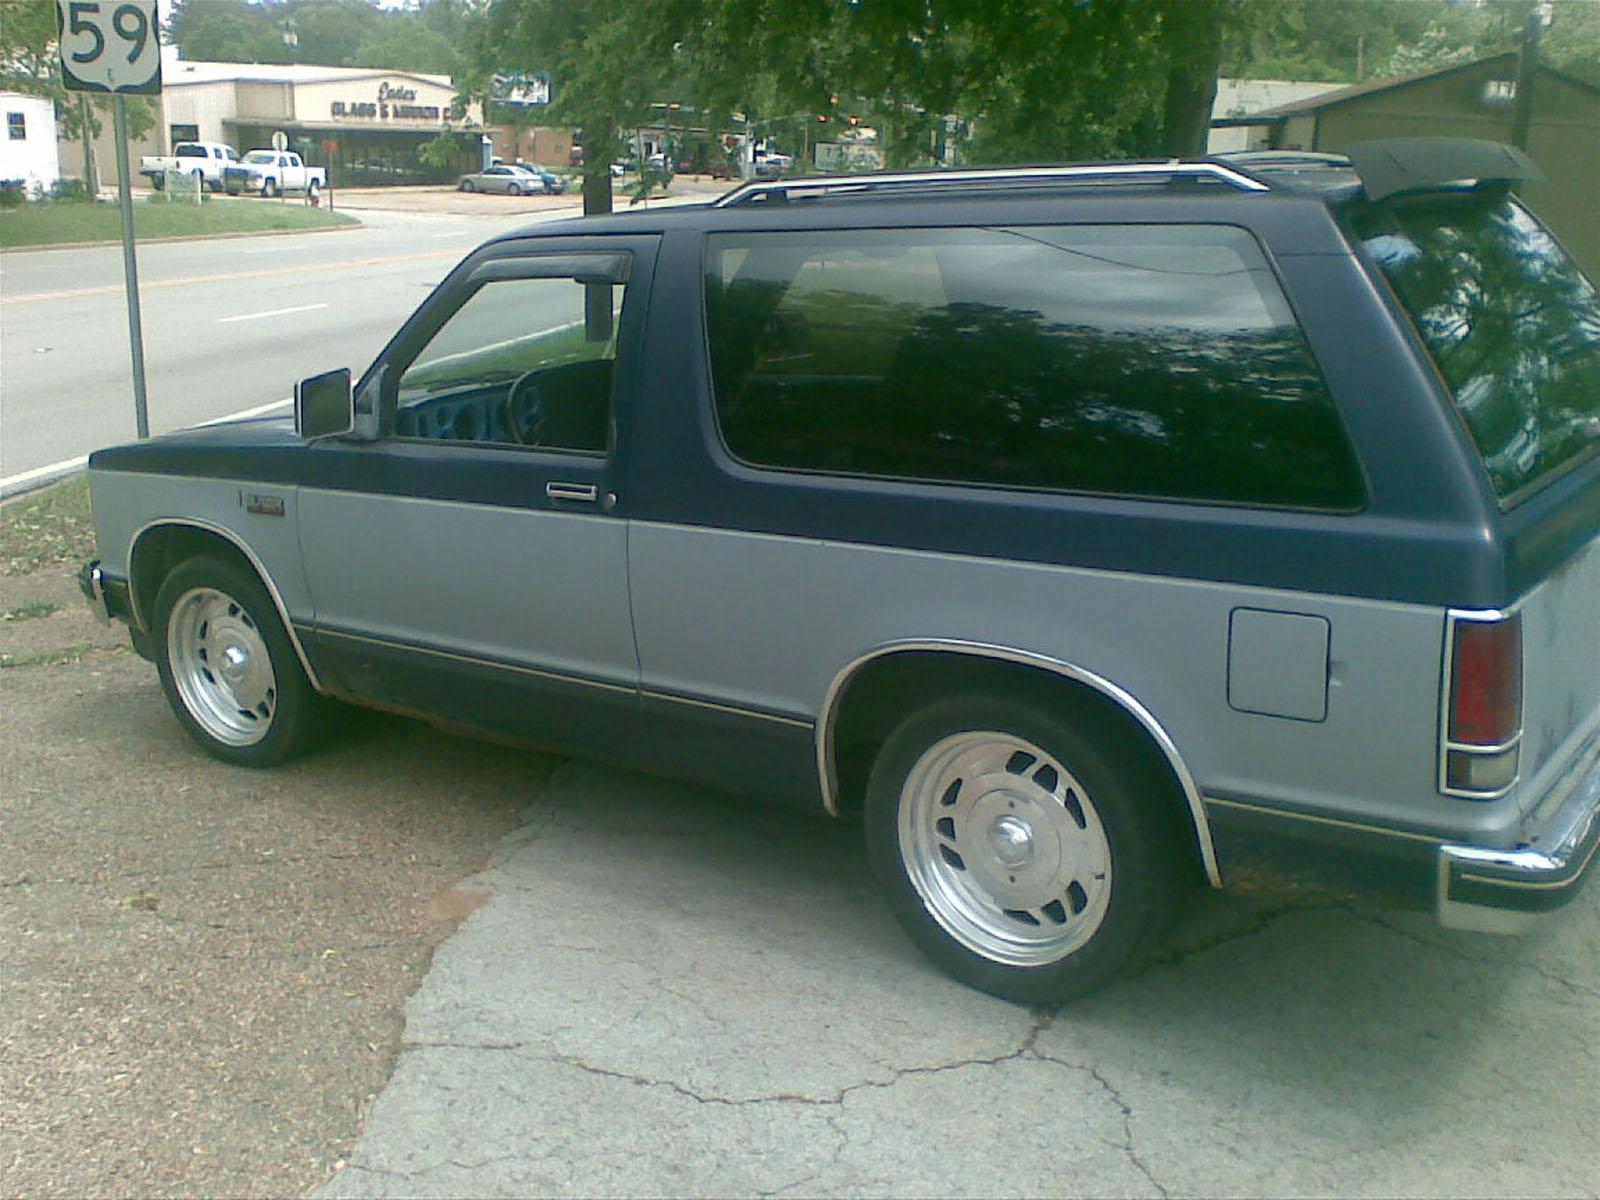 1985 Chevrolet S-10 Blazer For Sale | Nacogdoches Texas